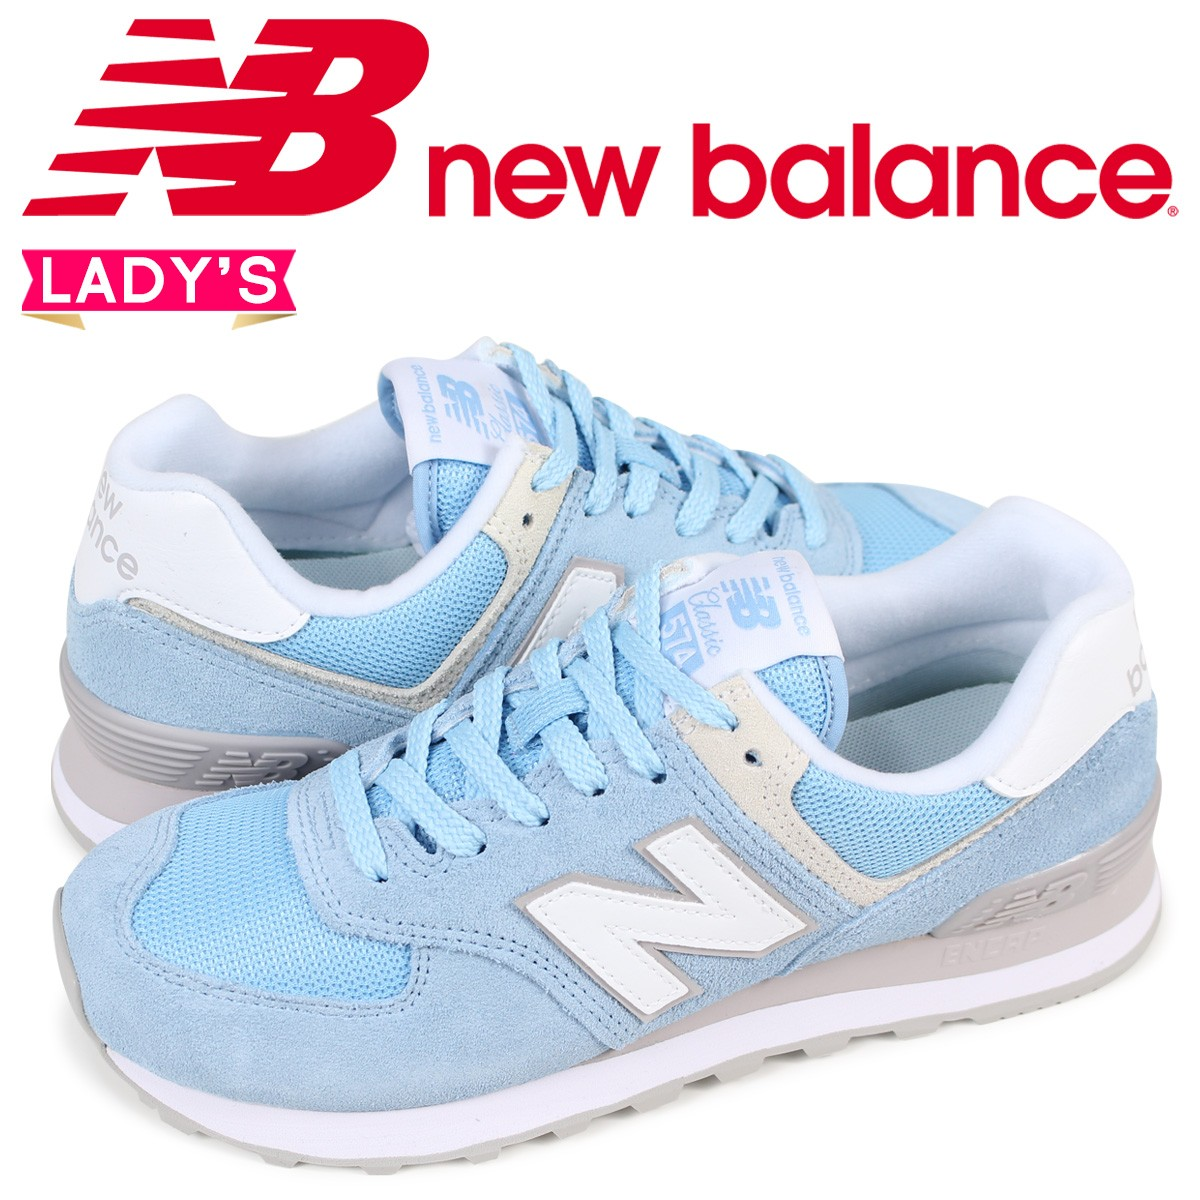 new balance WL574ESB ニューバランス 574 レディース スニーカー Bワイズ ブルー [2/2 新入荷] [182]